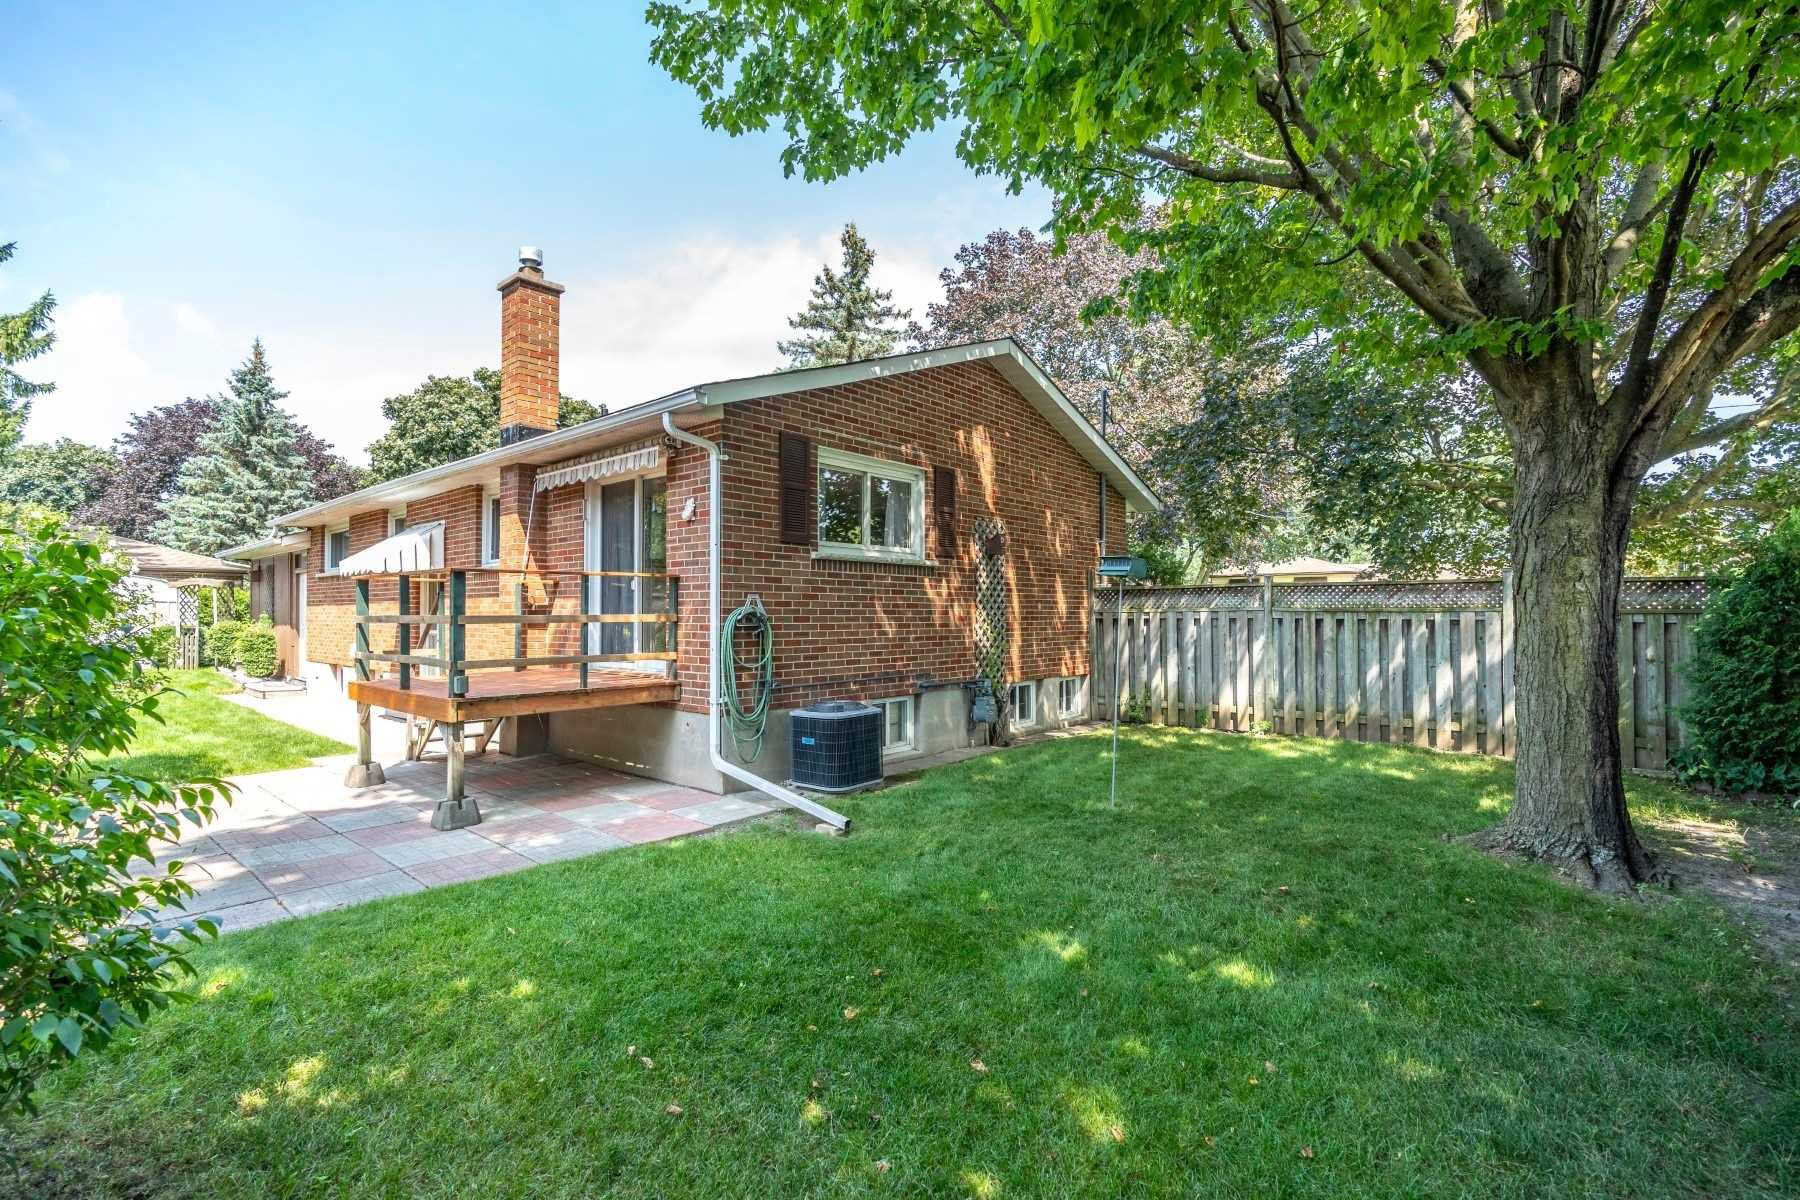 Photo 18: Photos: 1140 Northridge Street in Oshawa: Centennial House (Bungalow) for sale : MLS®# E4571459